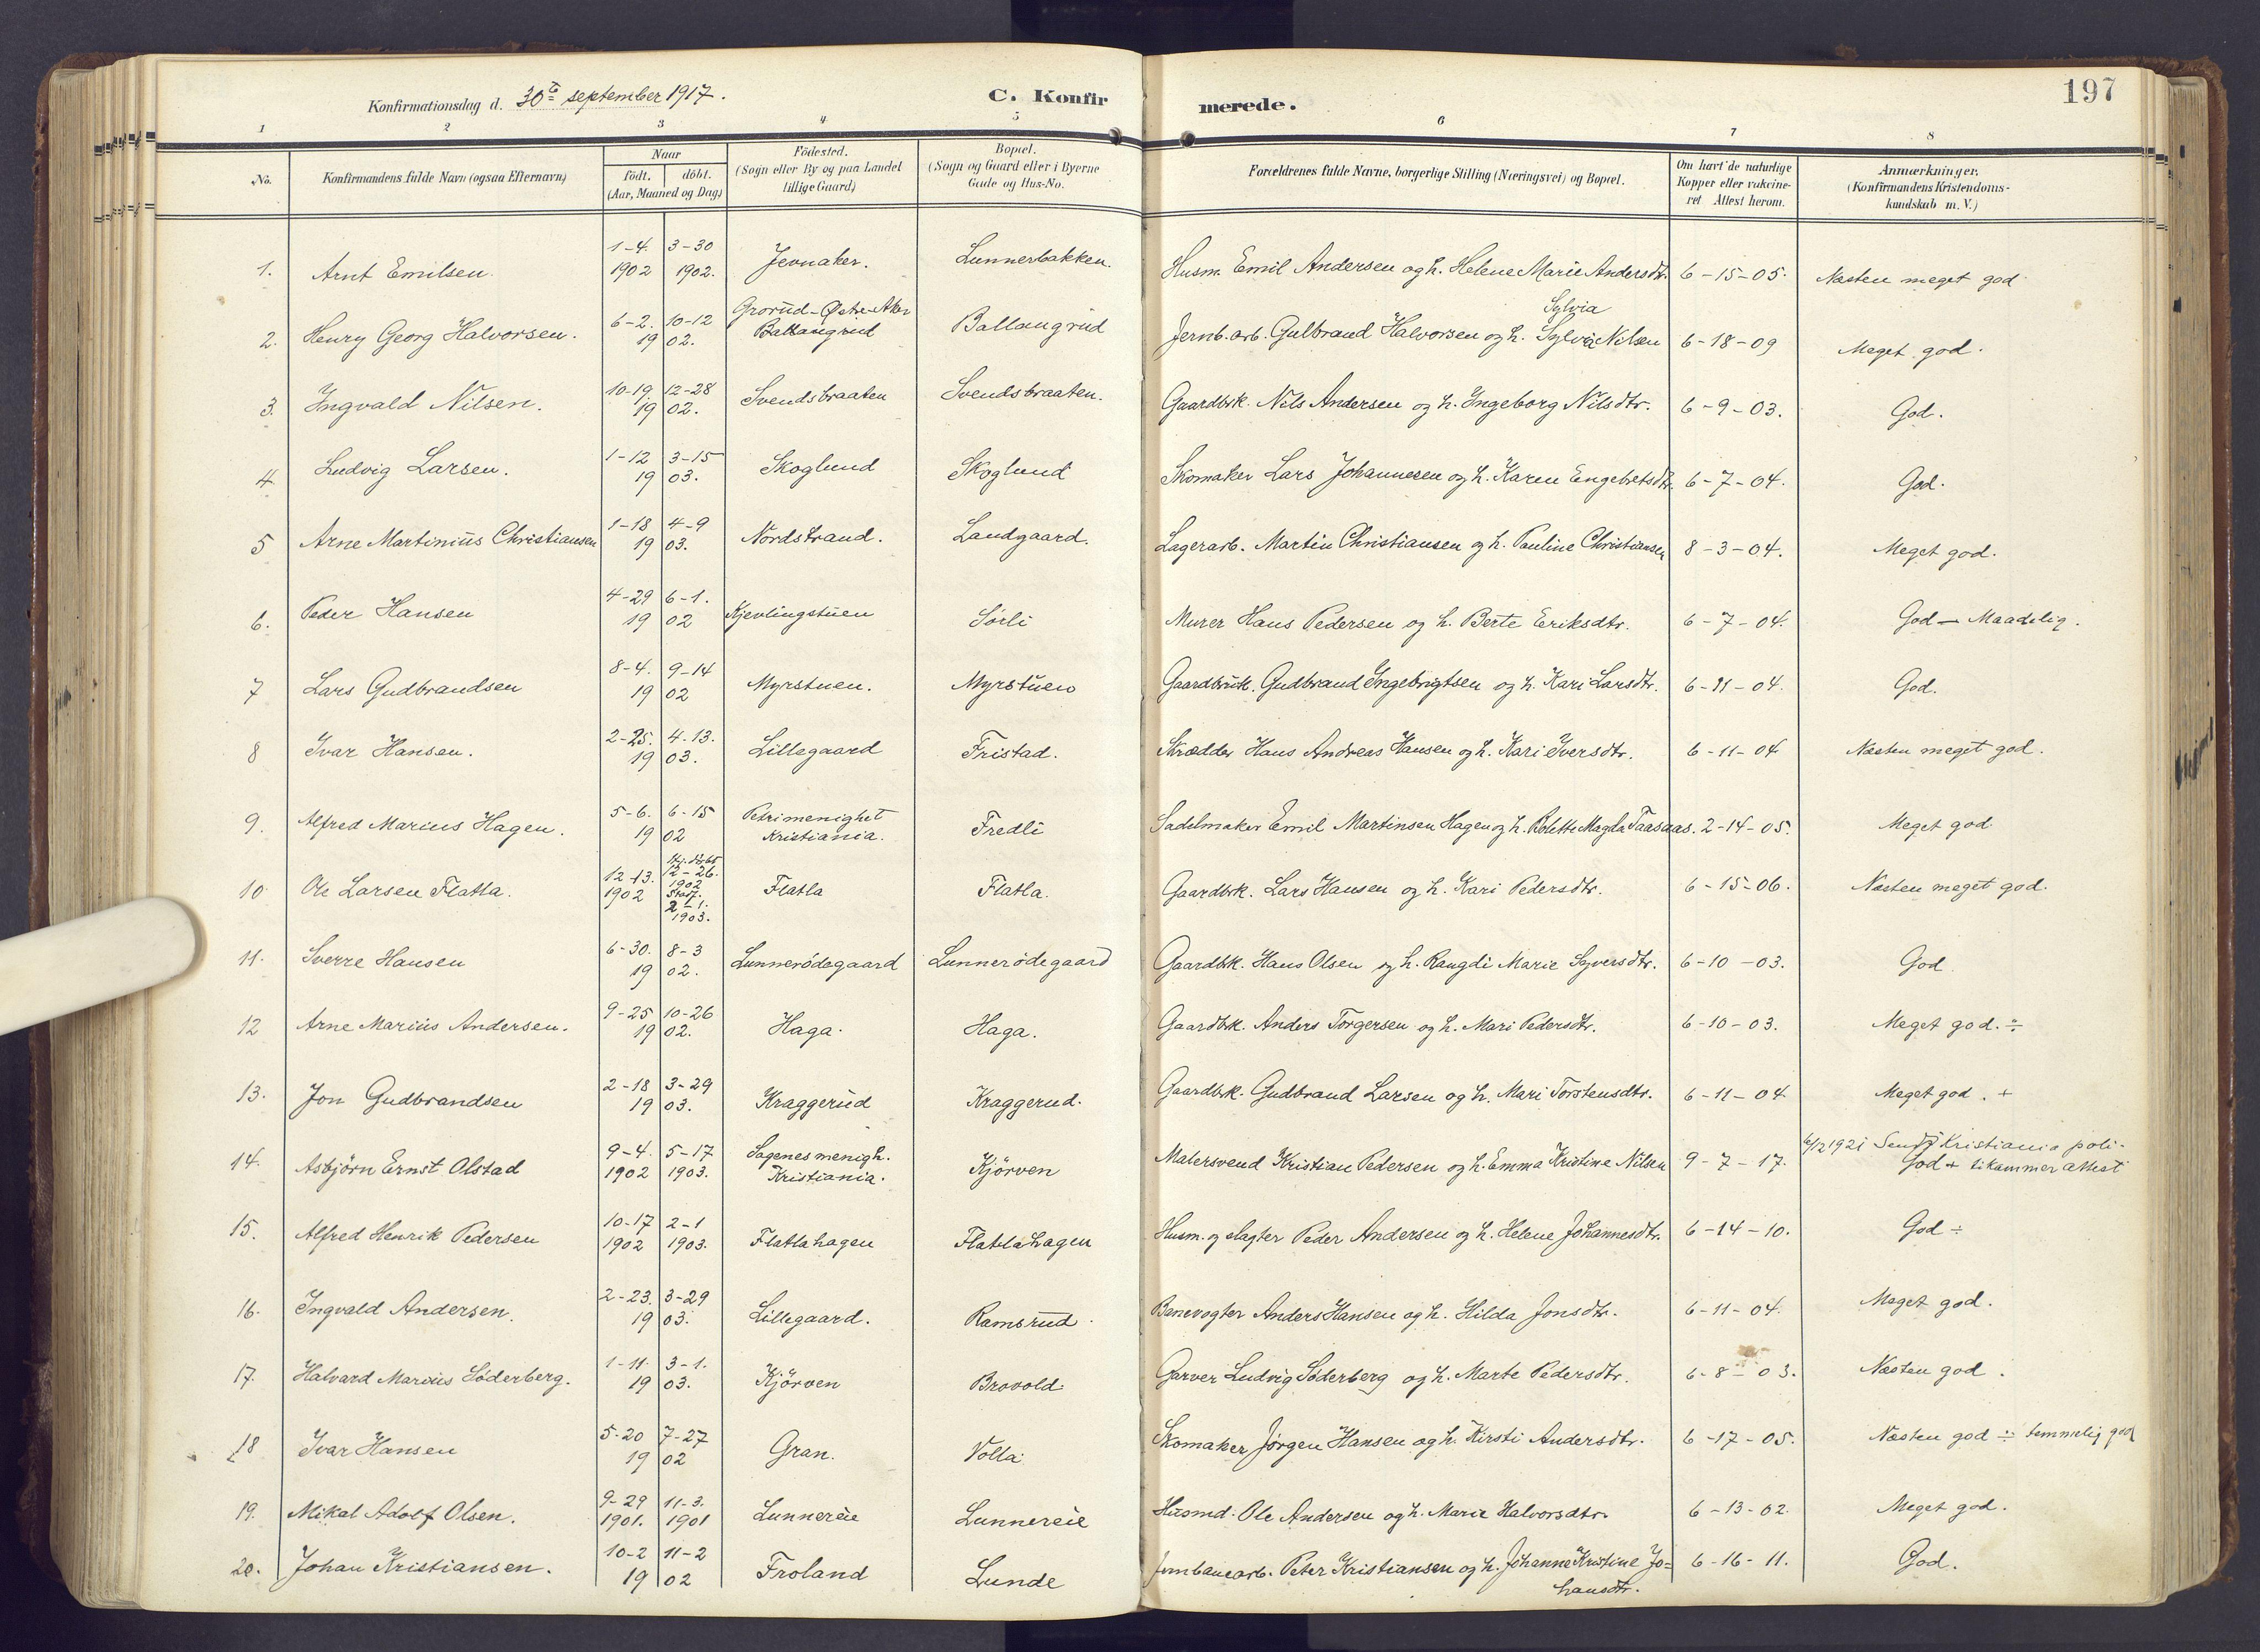 SAH, Lunner prestekontor, H/Ha/Haa/L0001: Ministerialbok nr. 1, 1907-1922, s. 197